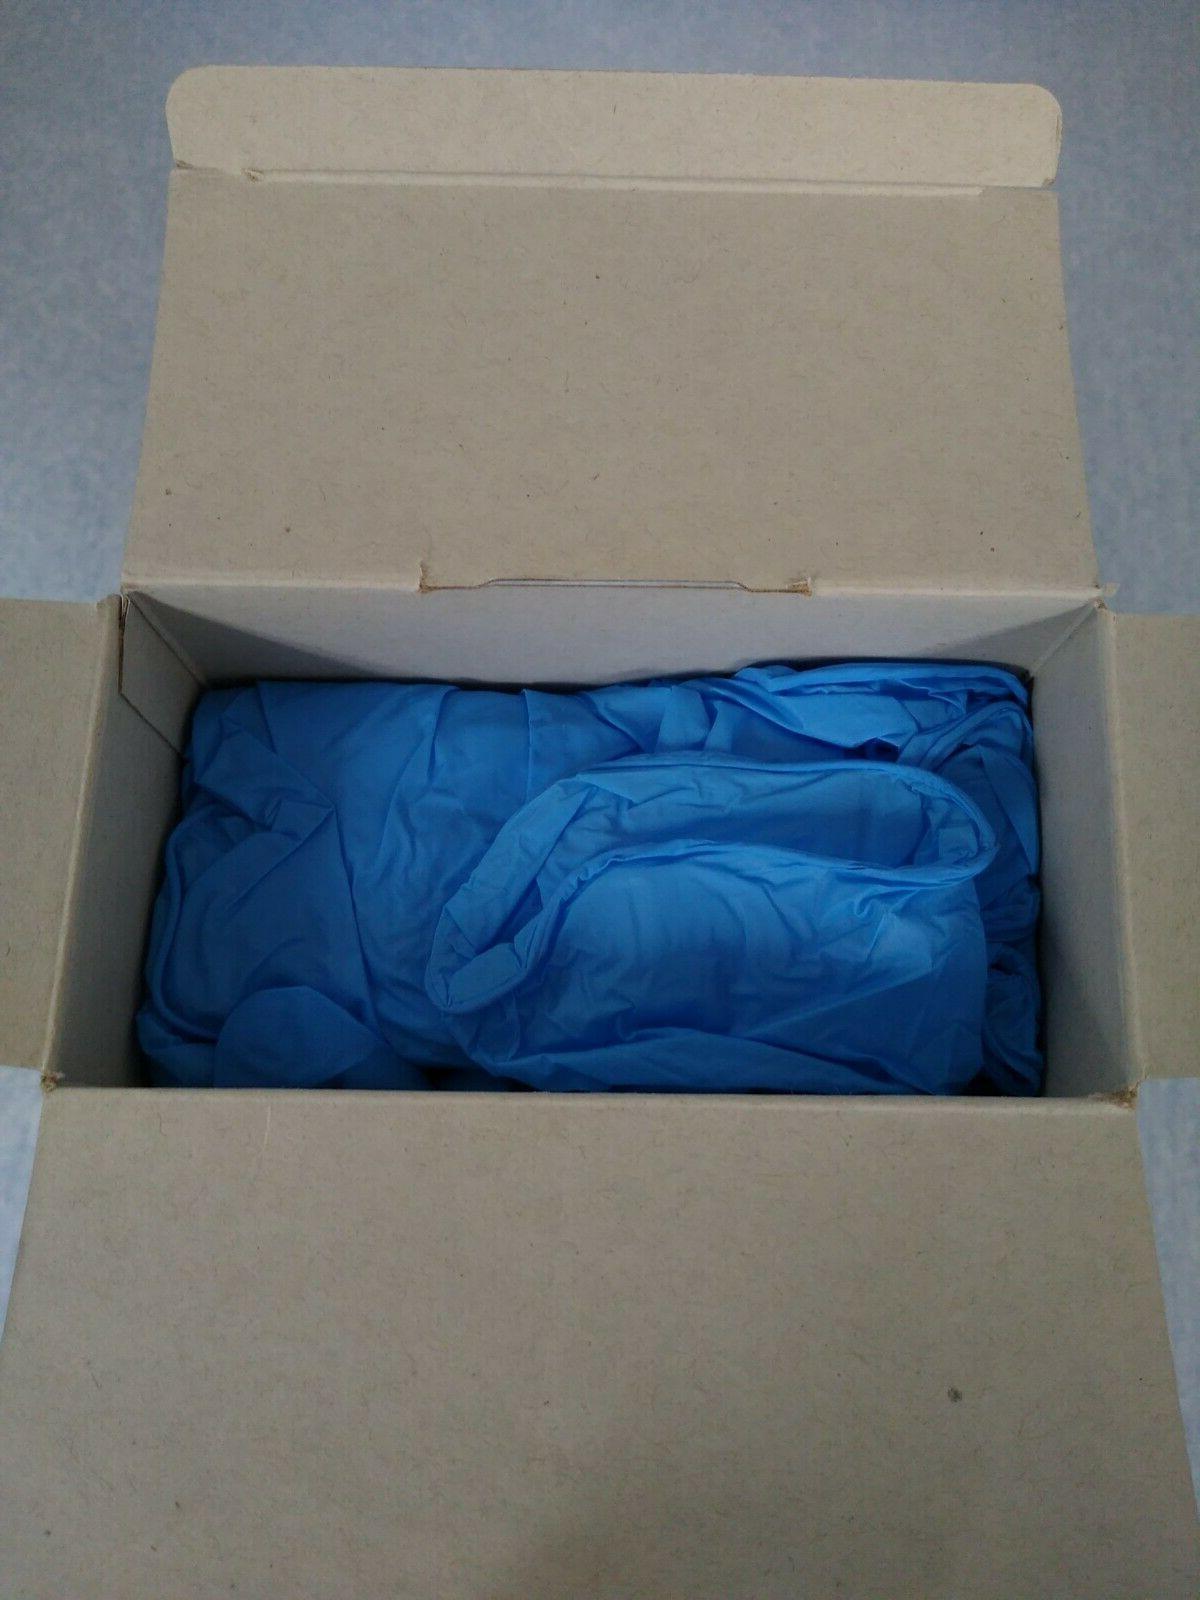 McKesson Nitrile Exam Gloves, of